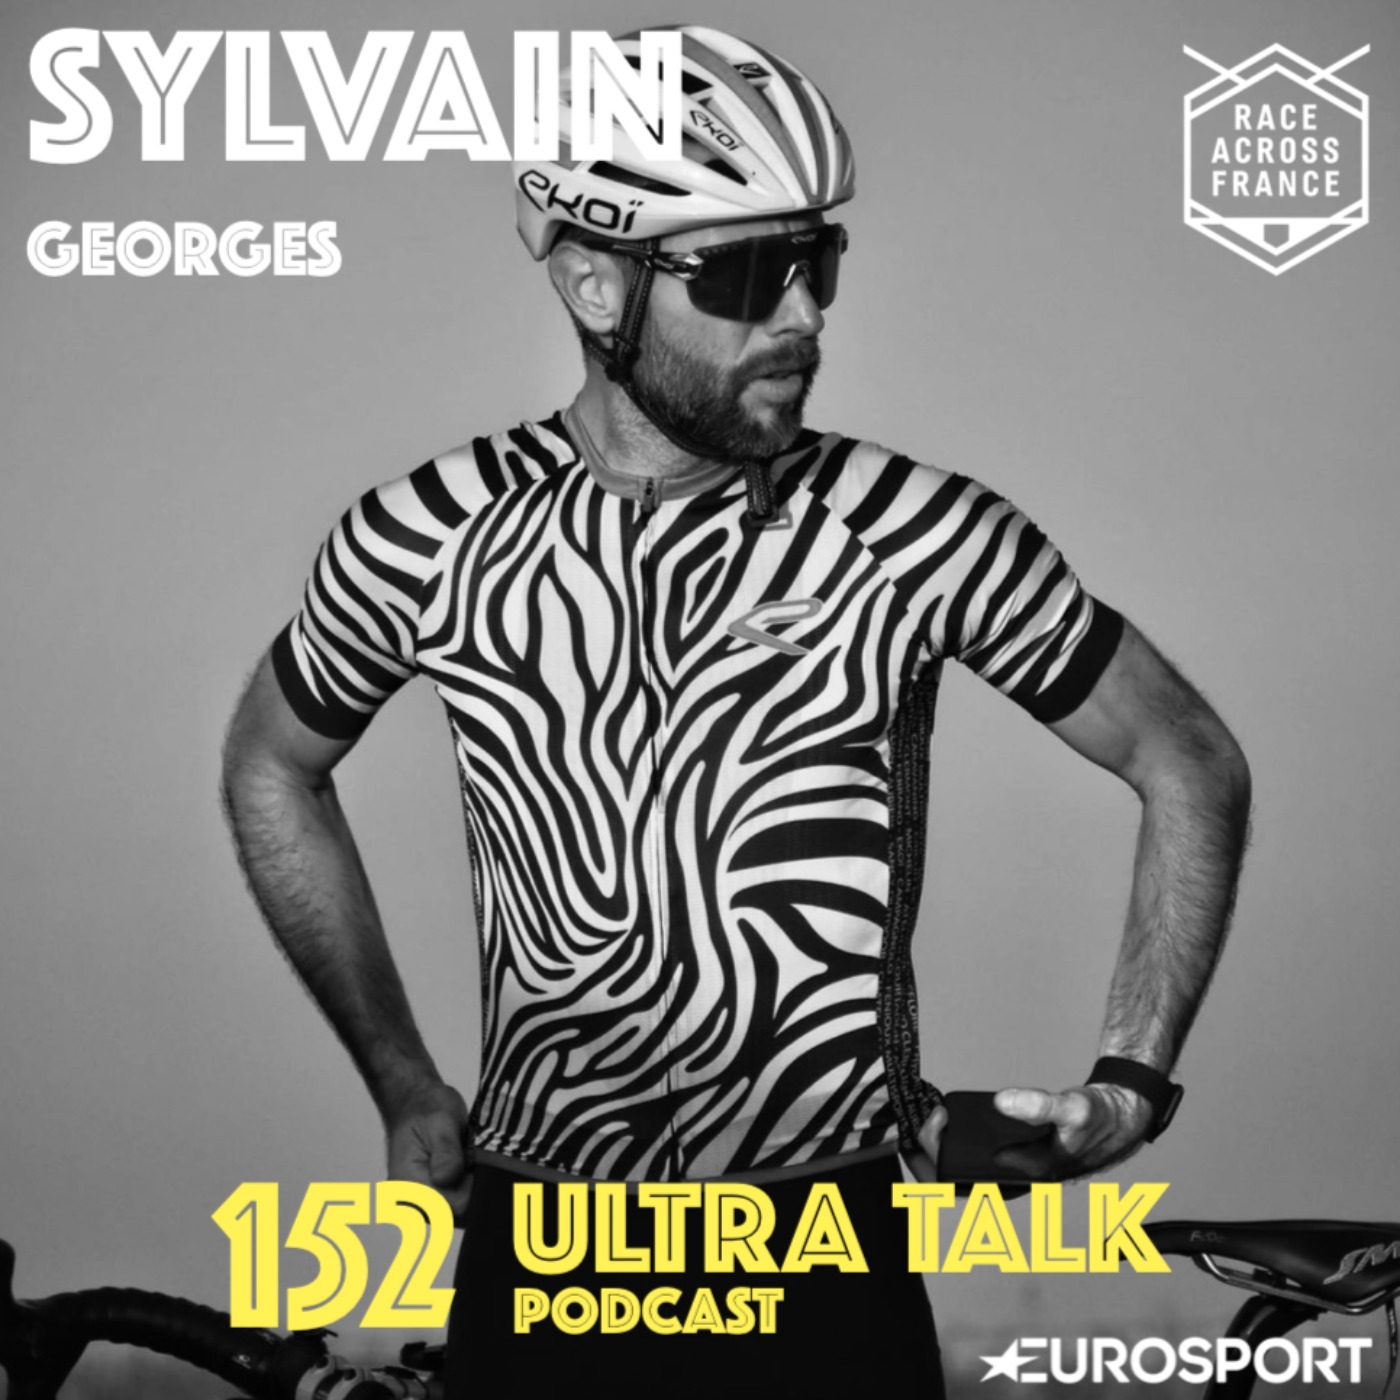 #152 Sylvain Georges